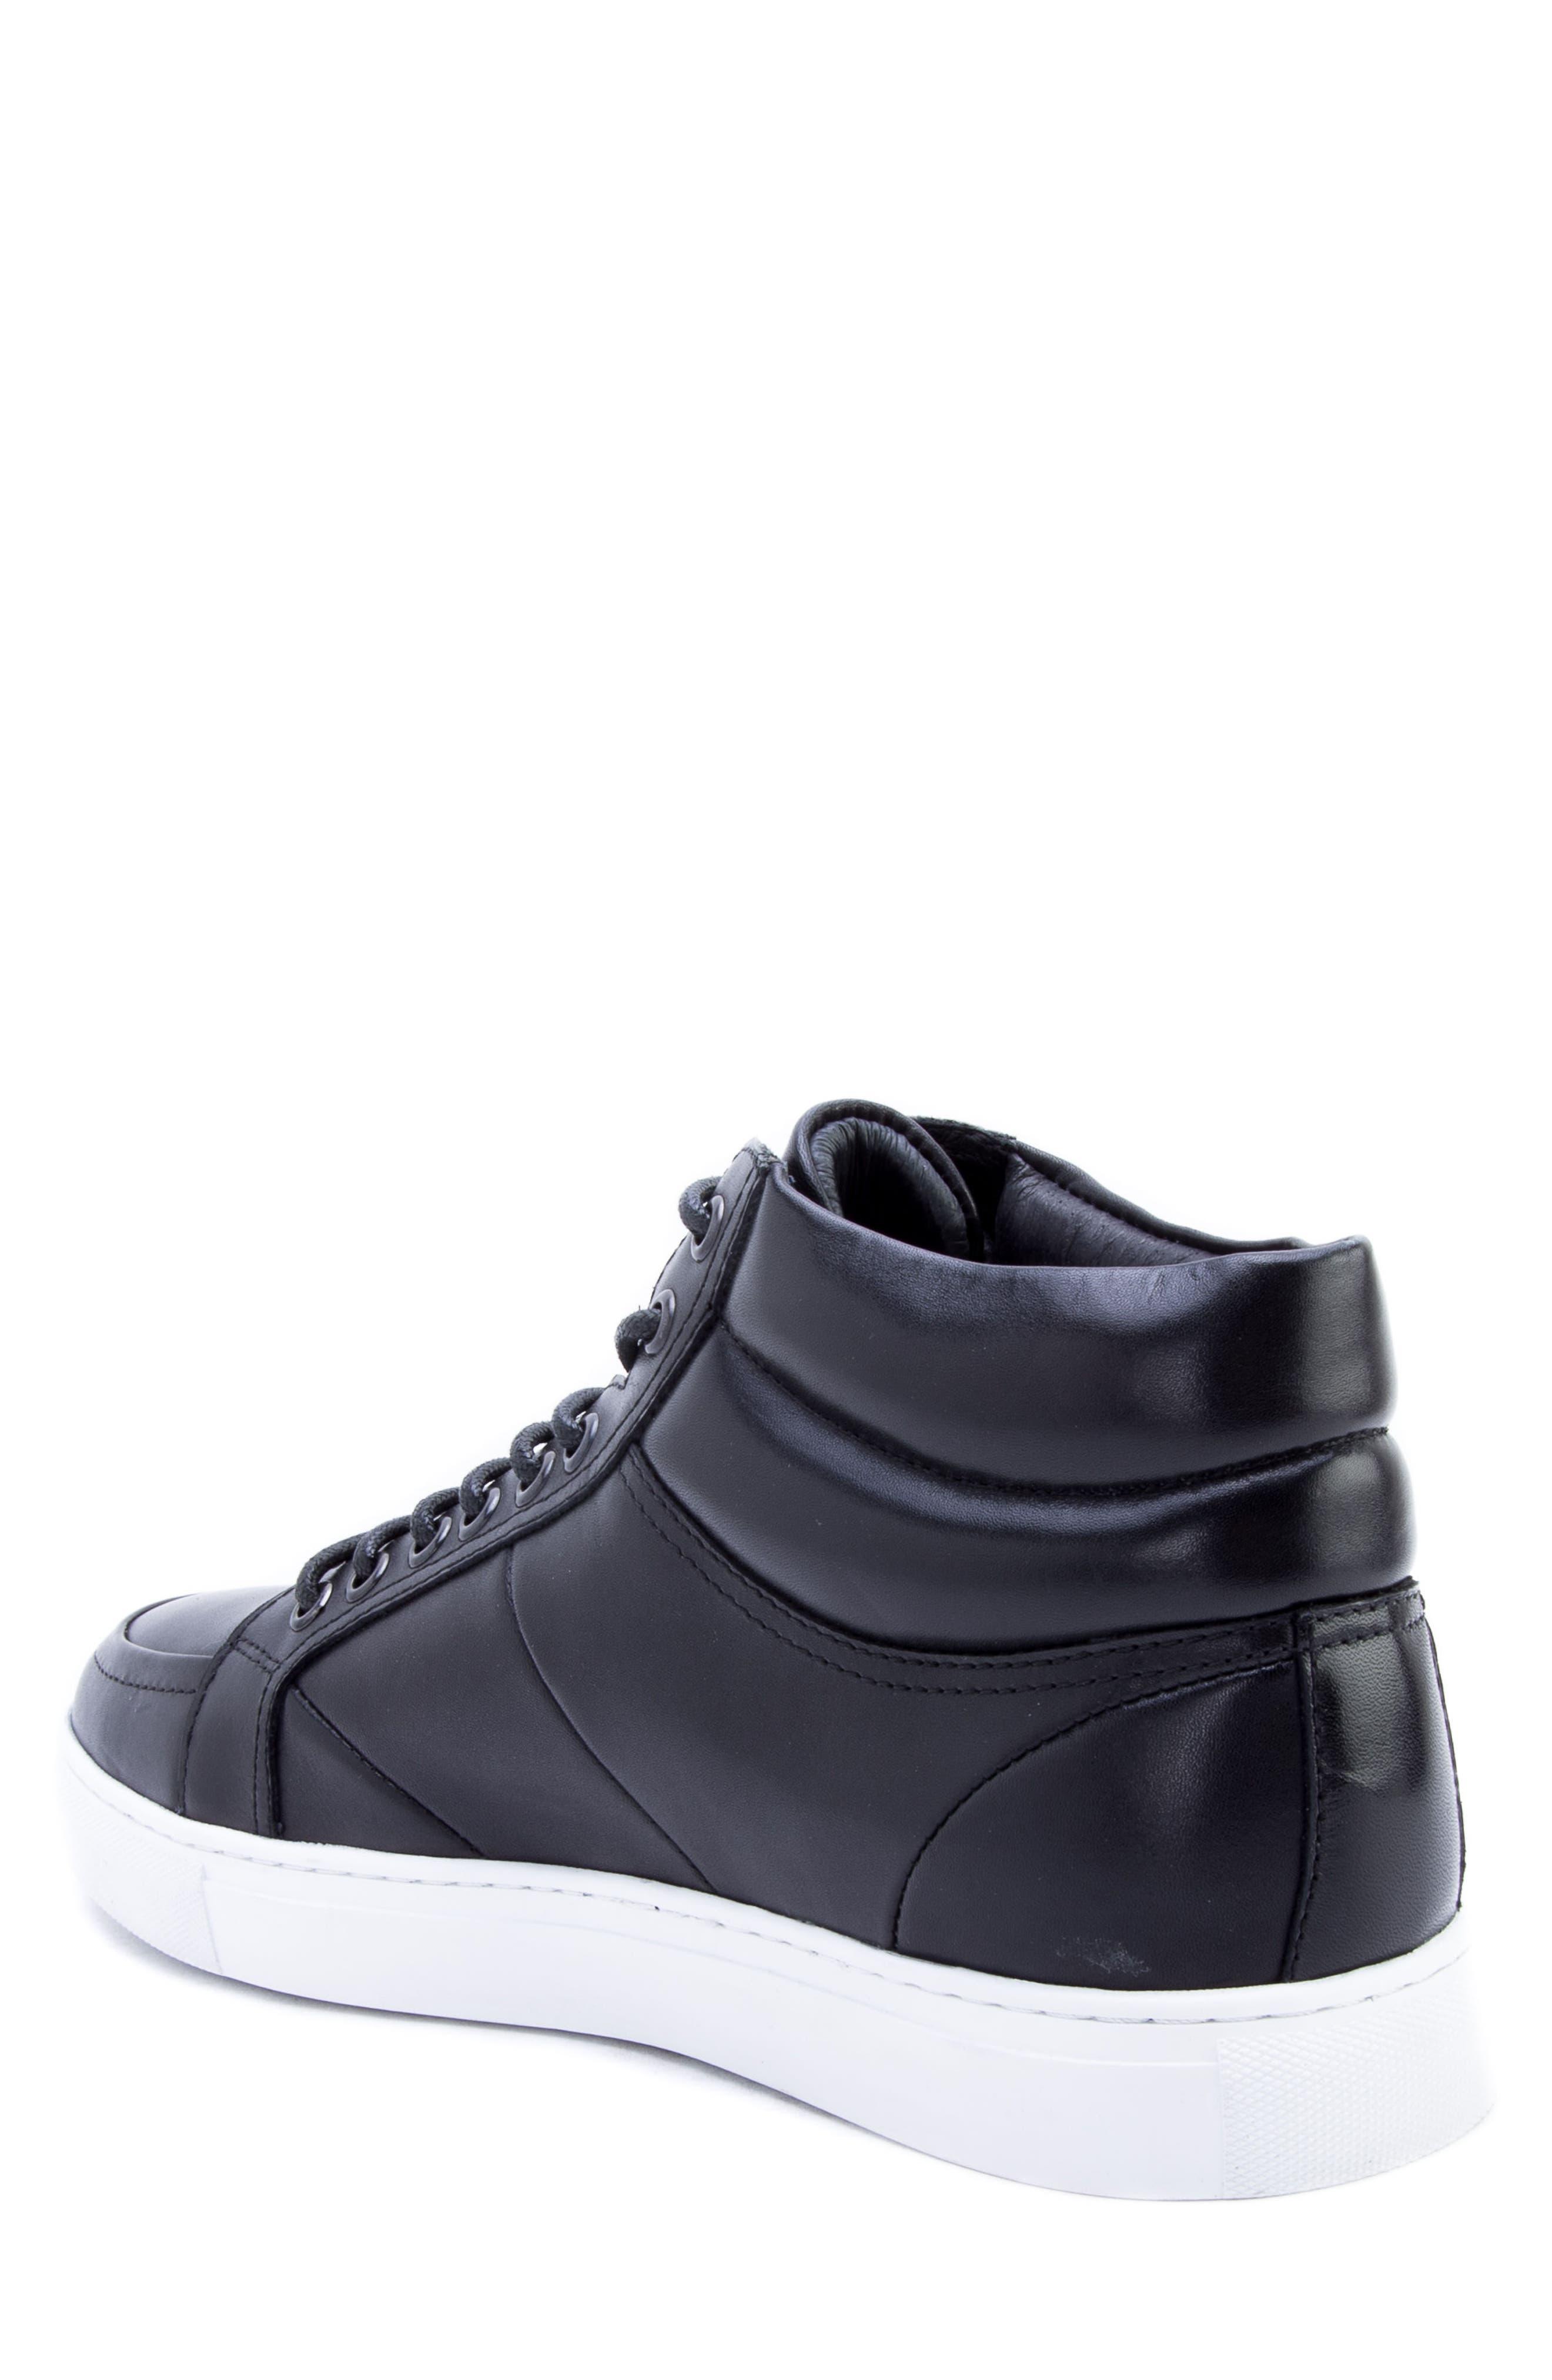 Tassel Mid Top Sneaker,                             Alternate thumbnail 2, color,                             BLACK LEATHER